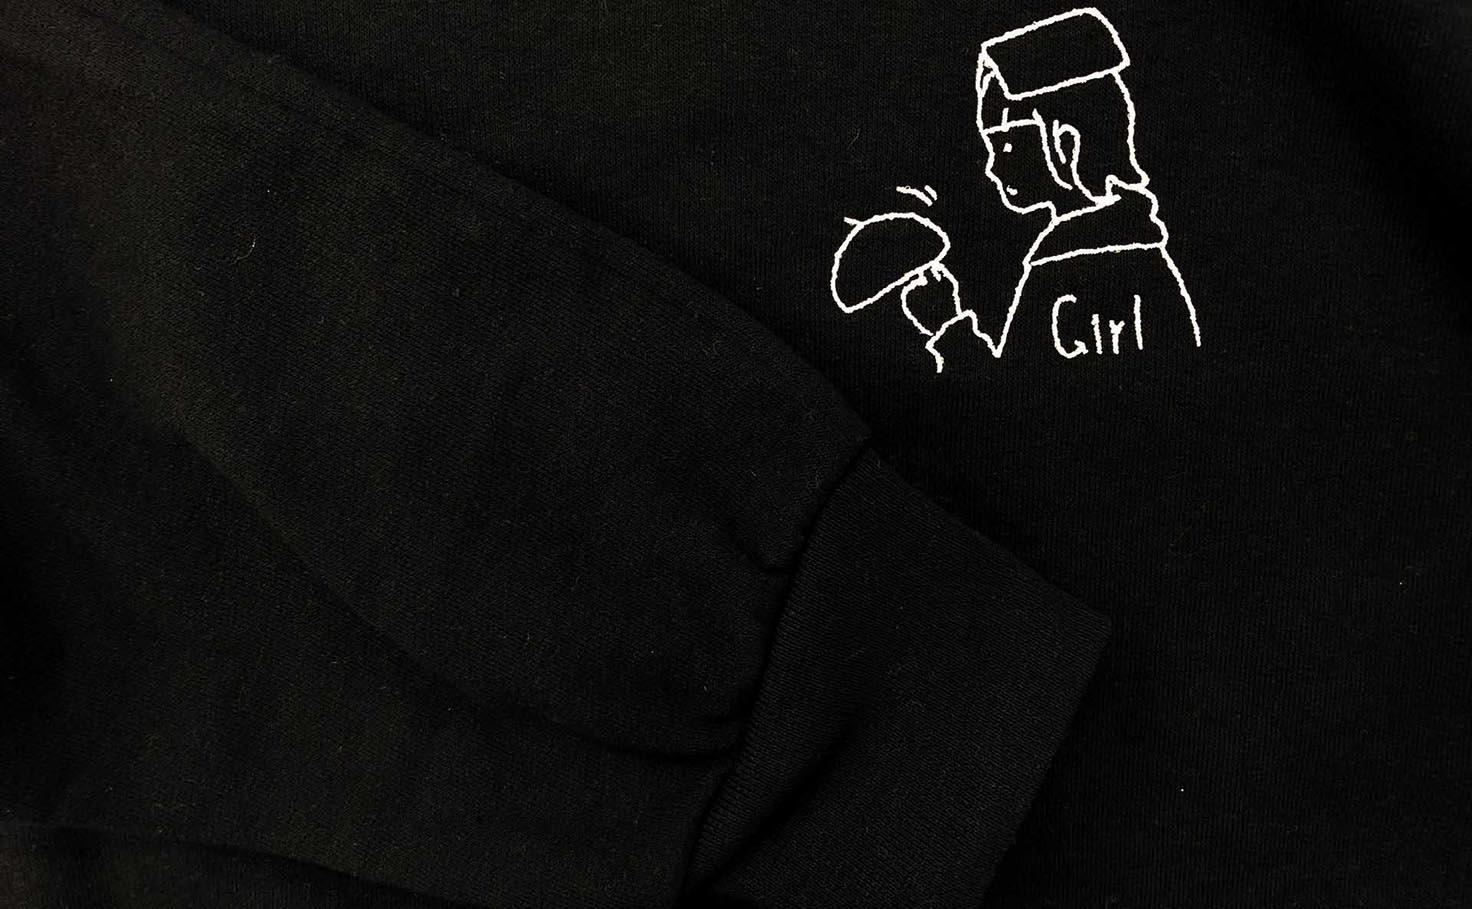 Girl(ブラック)